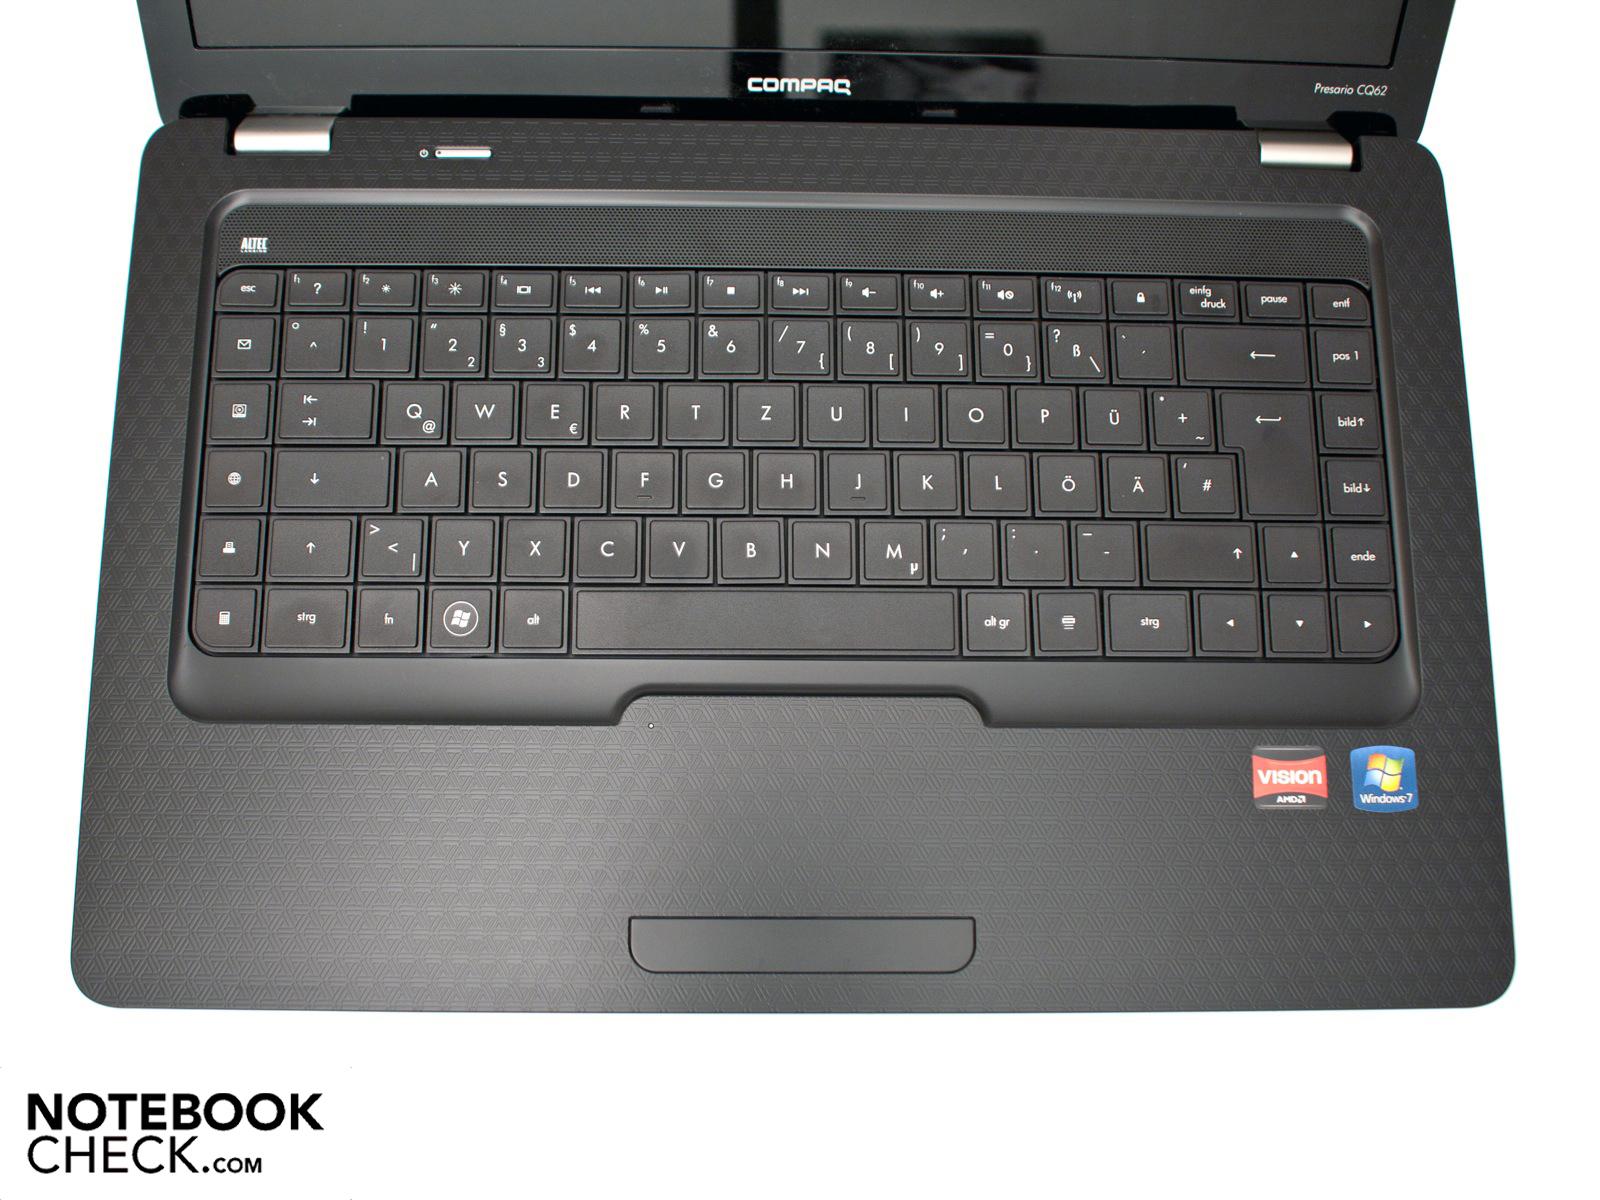 Review Hp Compaq Presario Cq62 Notebook Notebookcheck